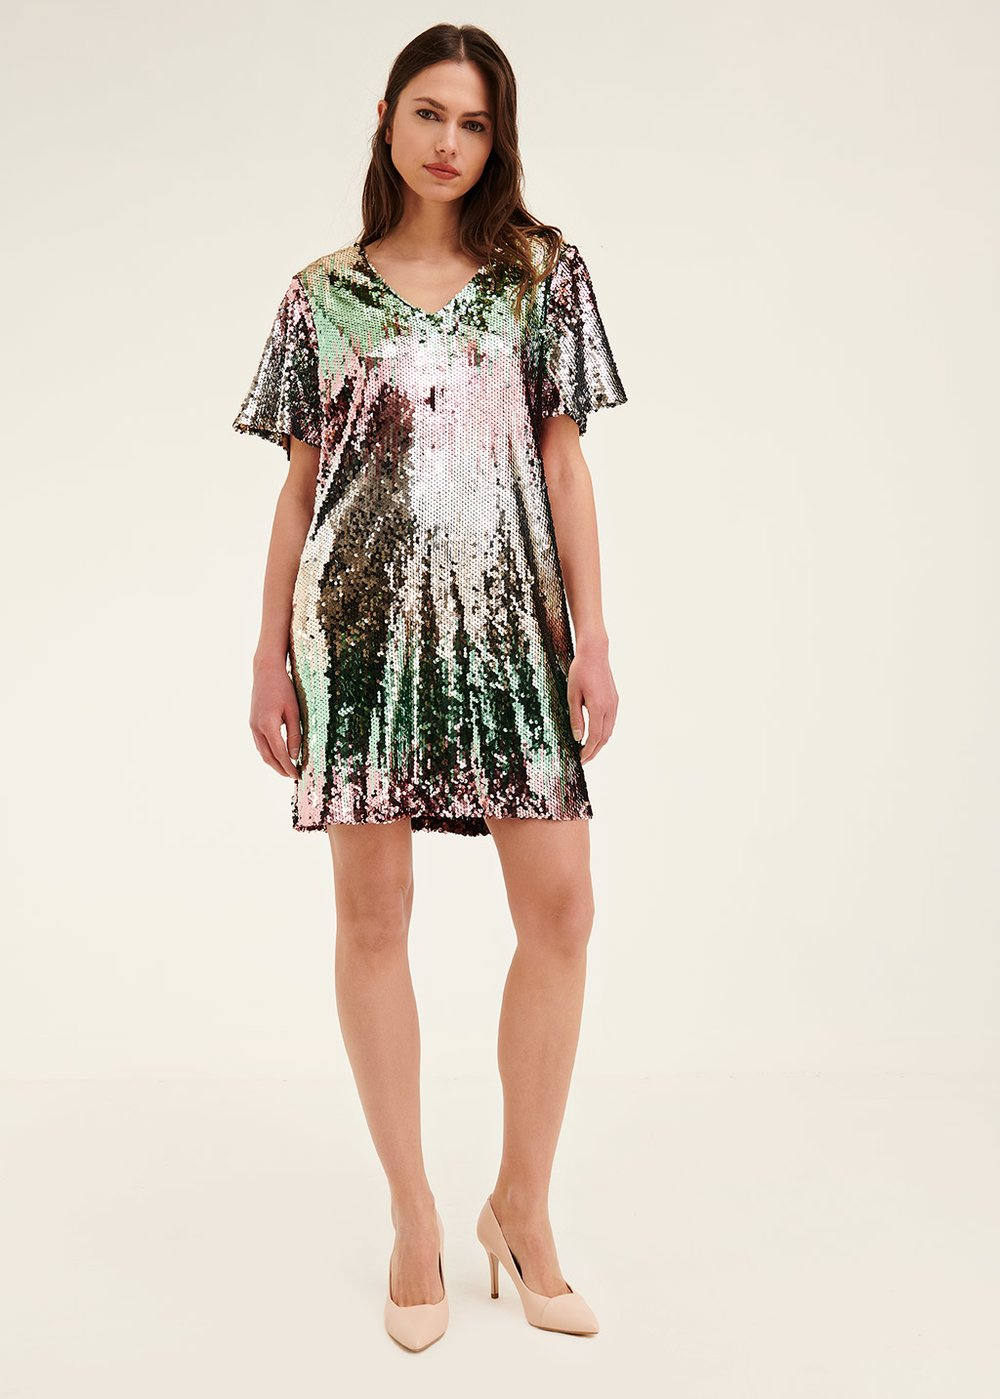 Angel sequined dress - Rosa \ Smeraldo - Woman